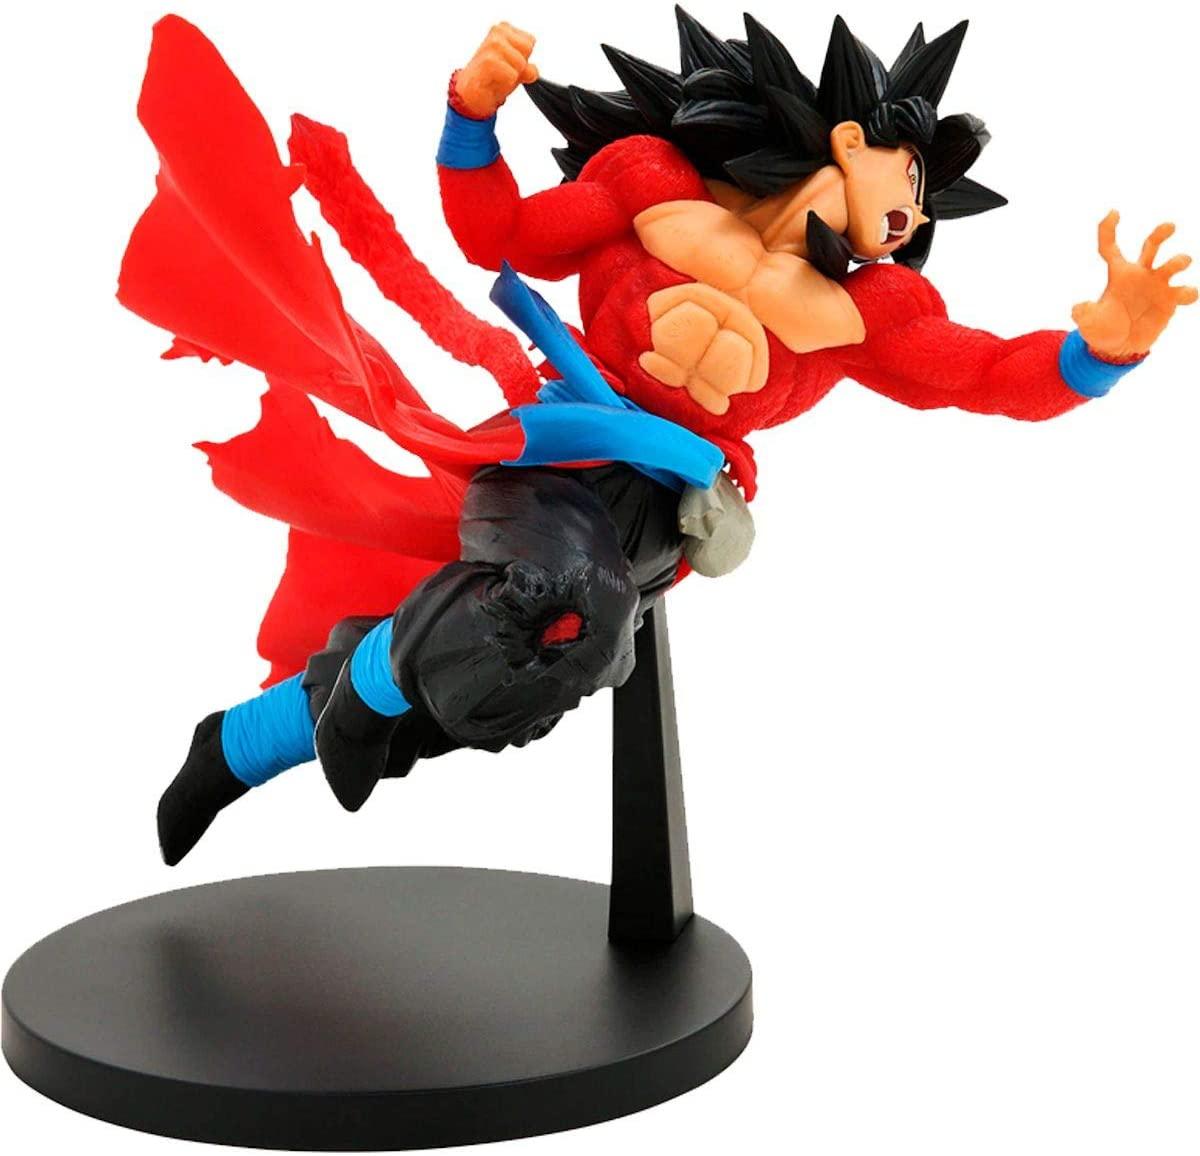 SUPER DRAGON BALL HEROES 9TH ANNIVERSARY FIGURE SUPER SAIYAN 4 SON GOKU XENO